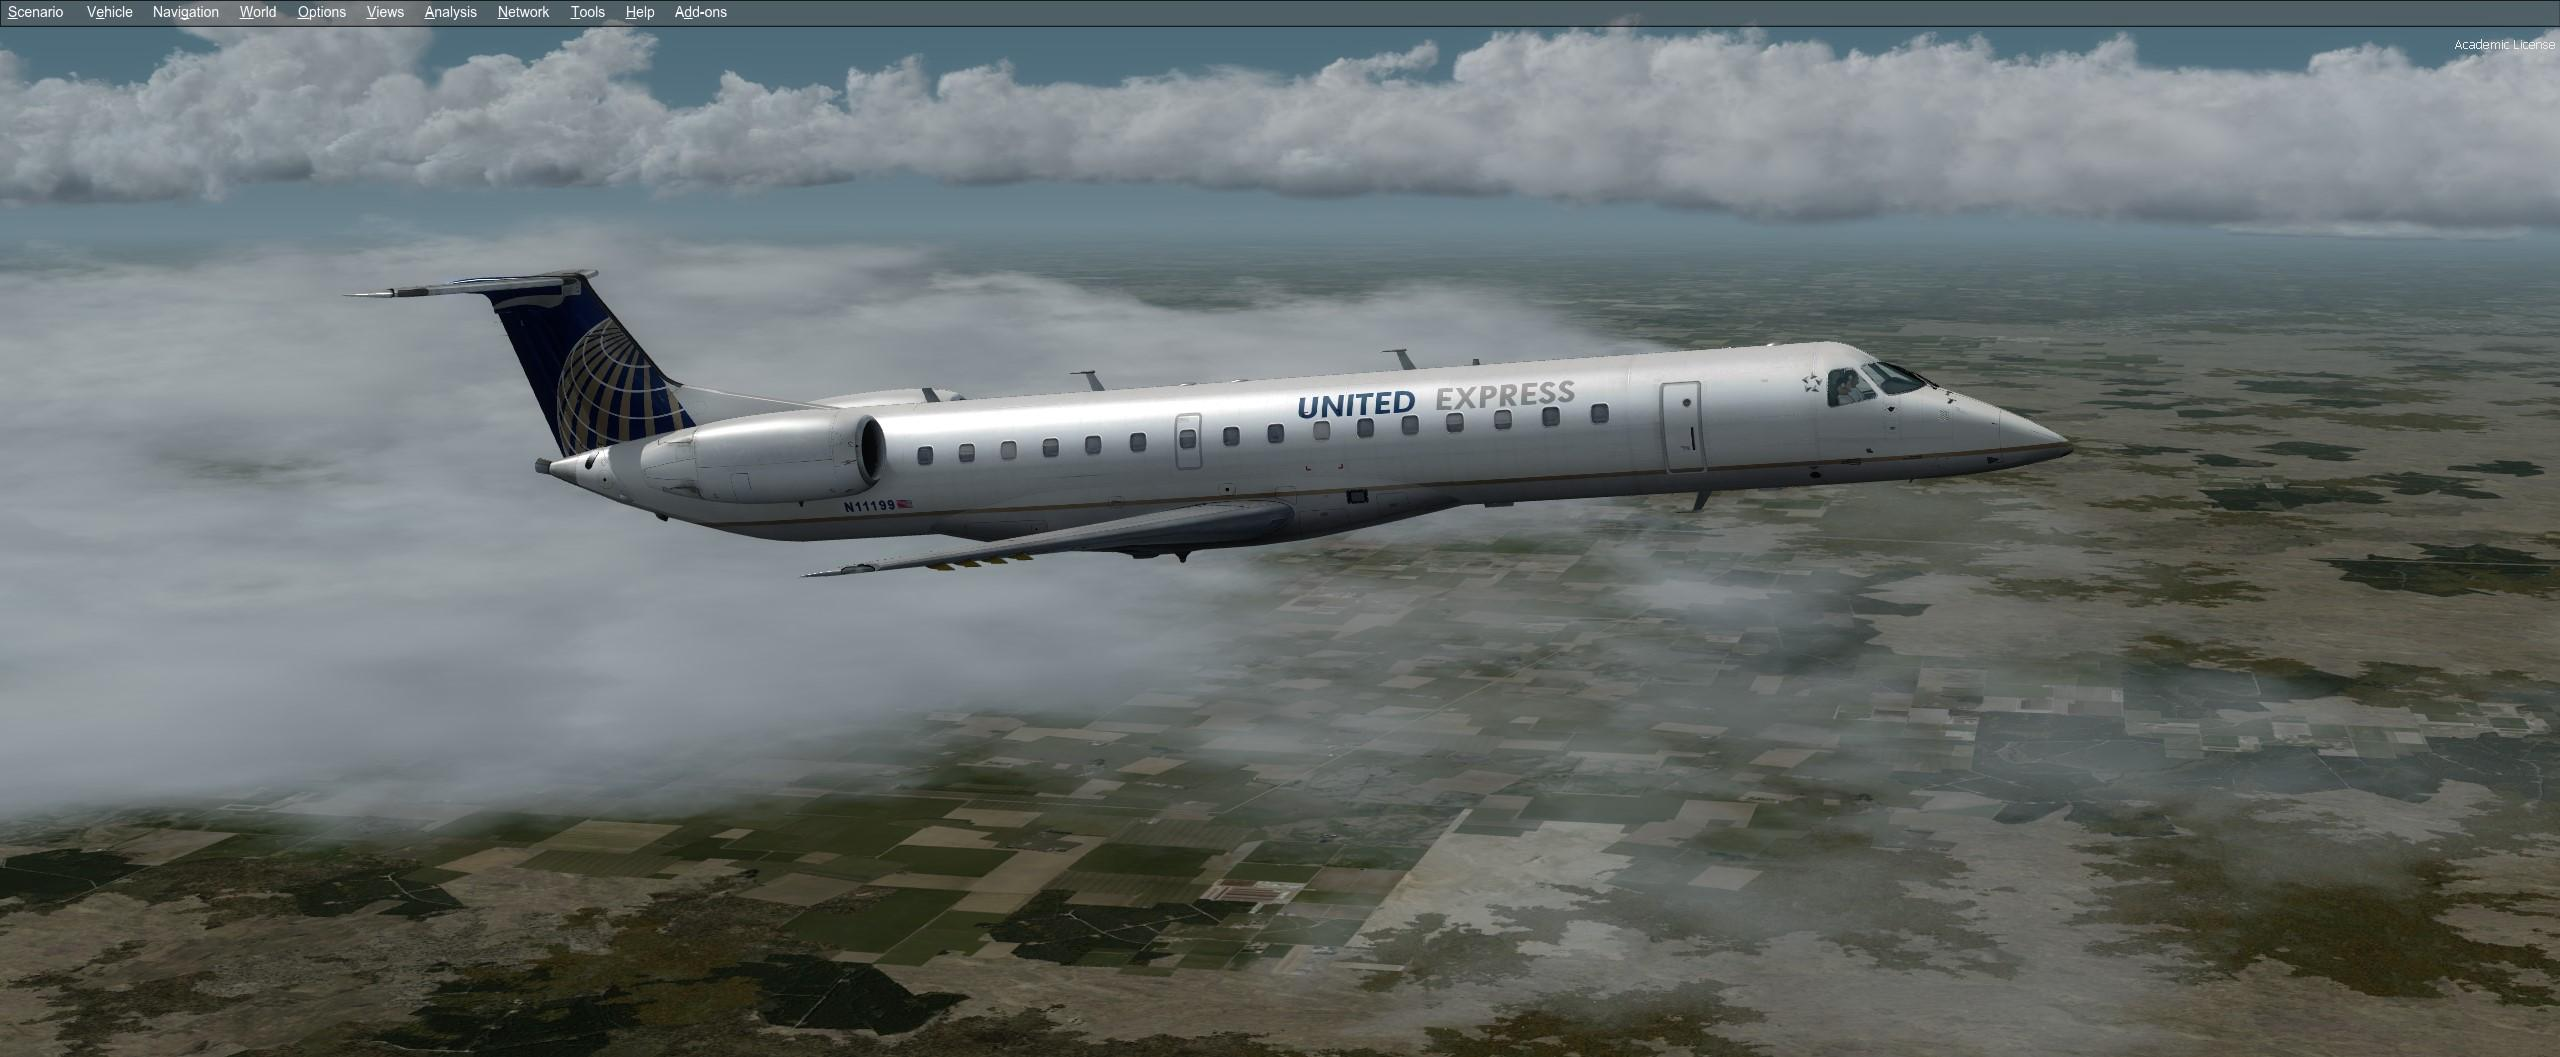 ERJ P3DV4 No Nav Lights, No Beacon, No Strobe - Airplanes - The